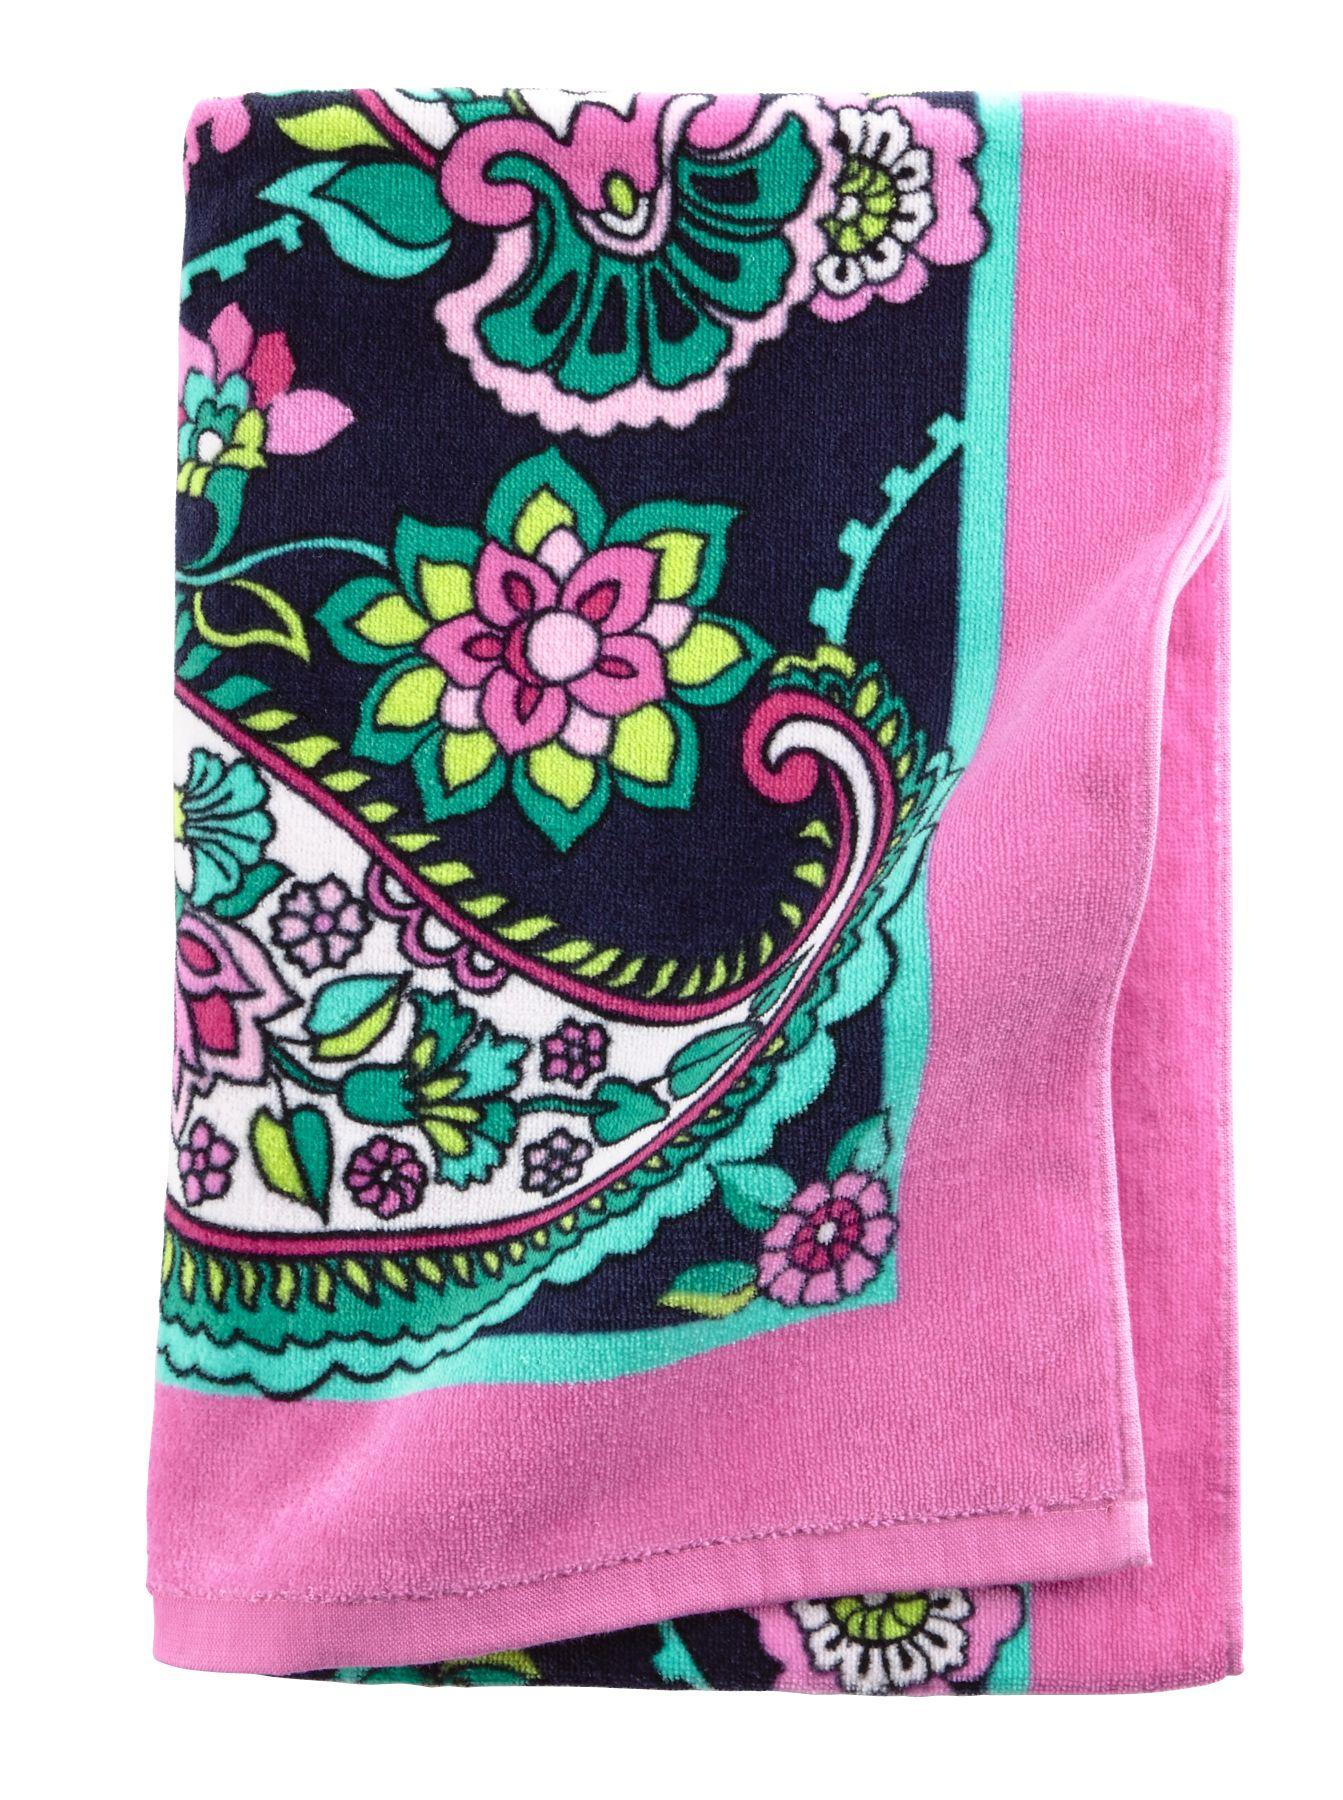 Vera Bradley Beach Towel in Petal Paisley $ 35.00